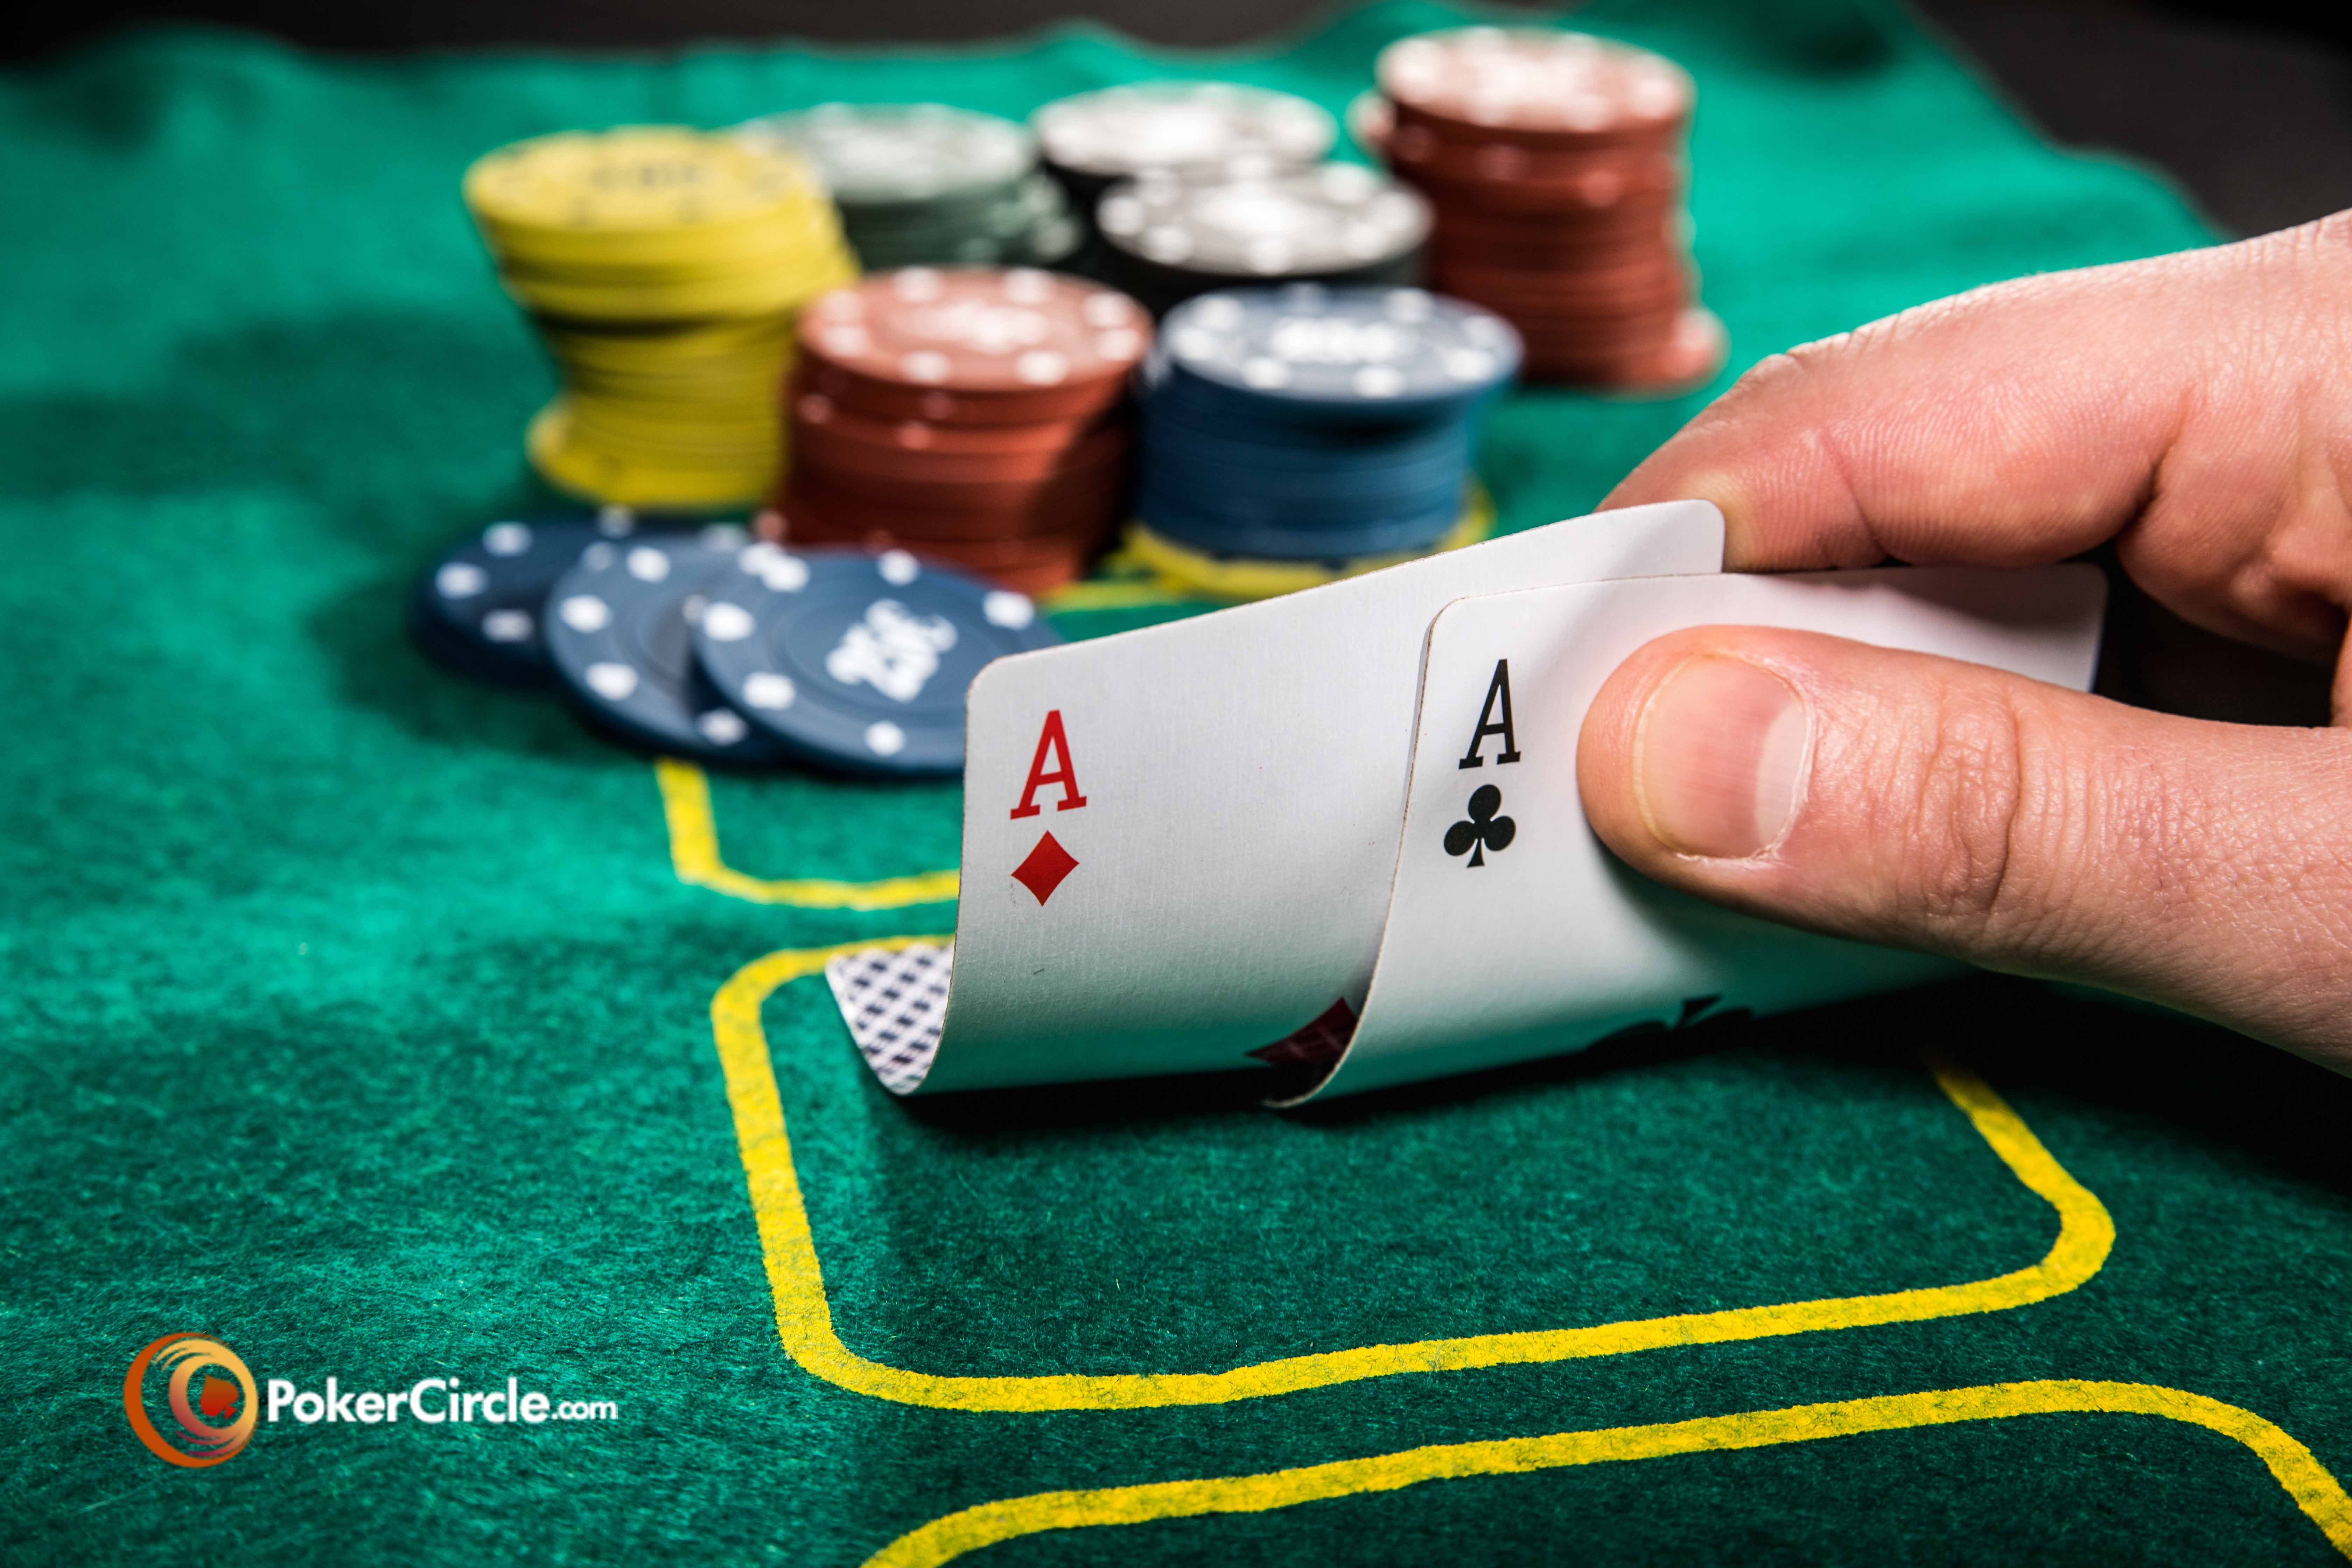 exert games gambling card